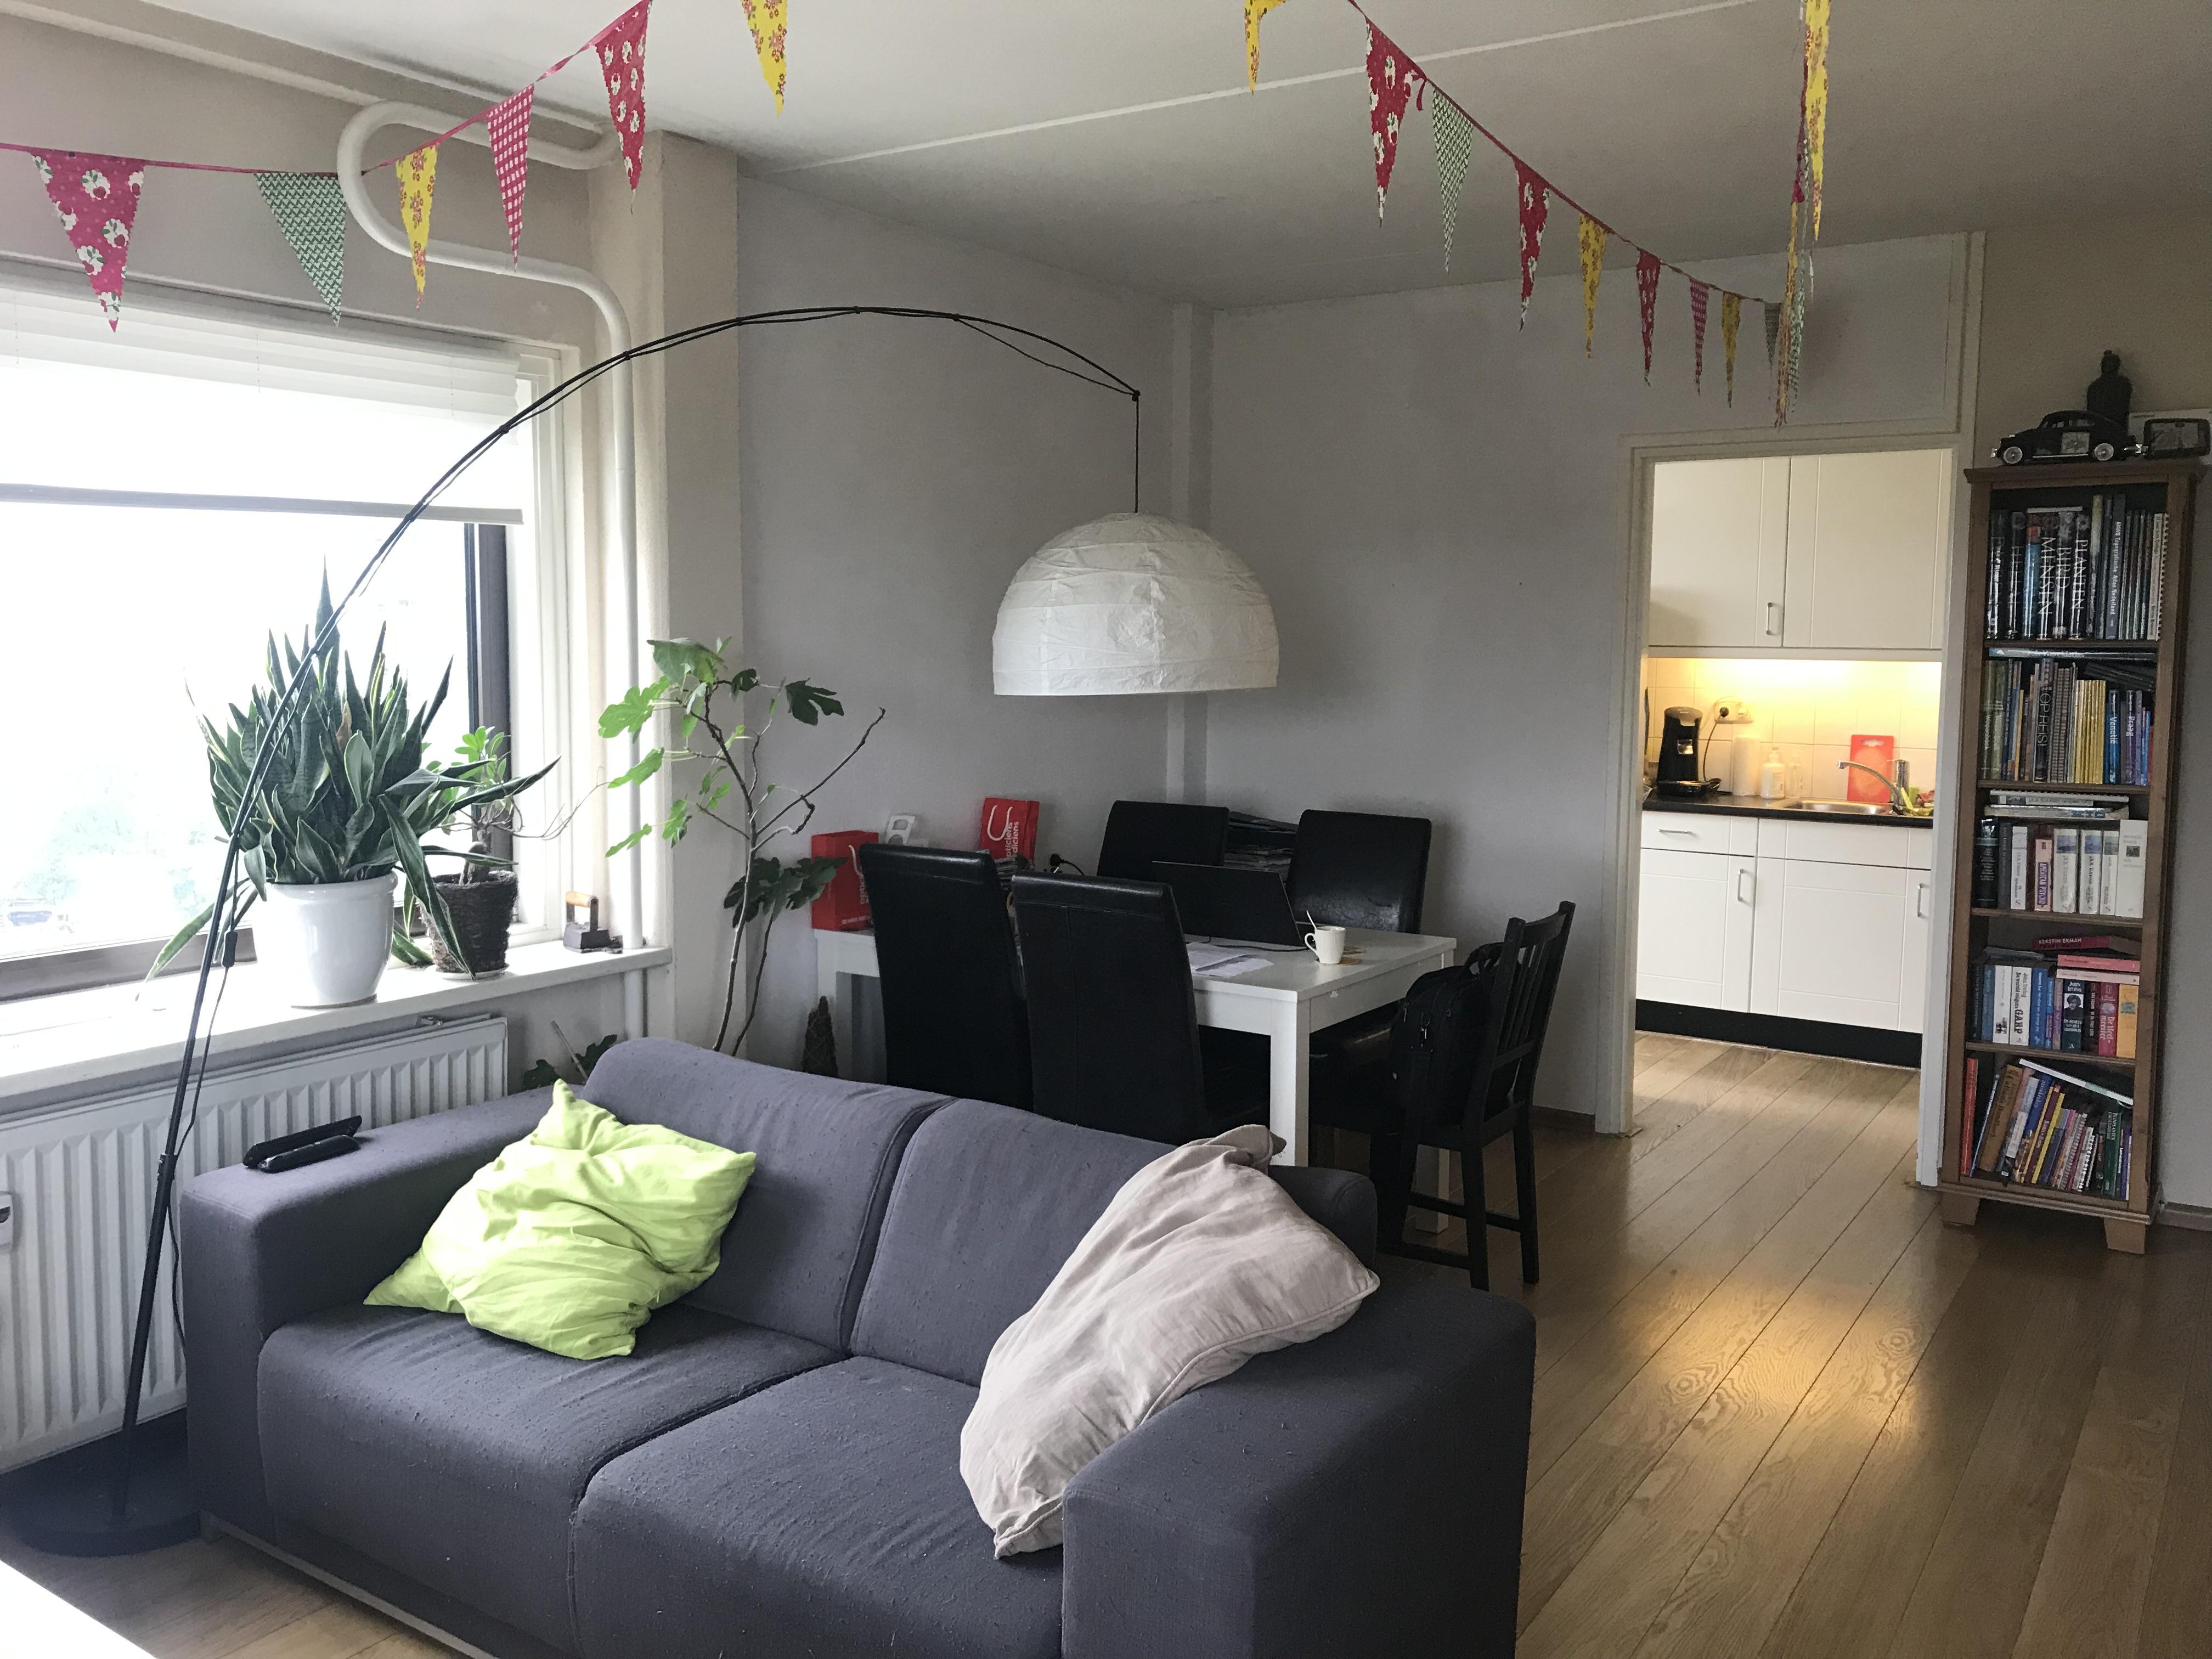 Kalmoesstraat, Apeldoorn